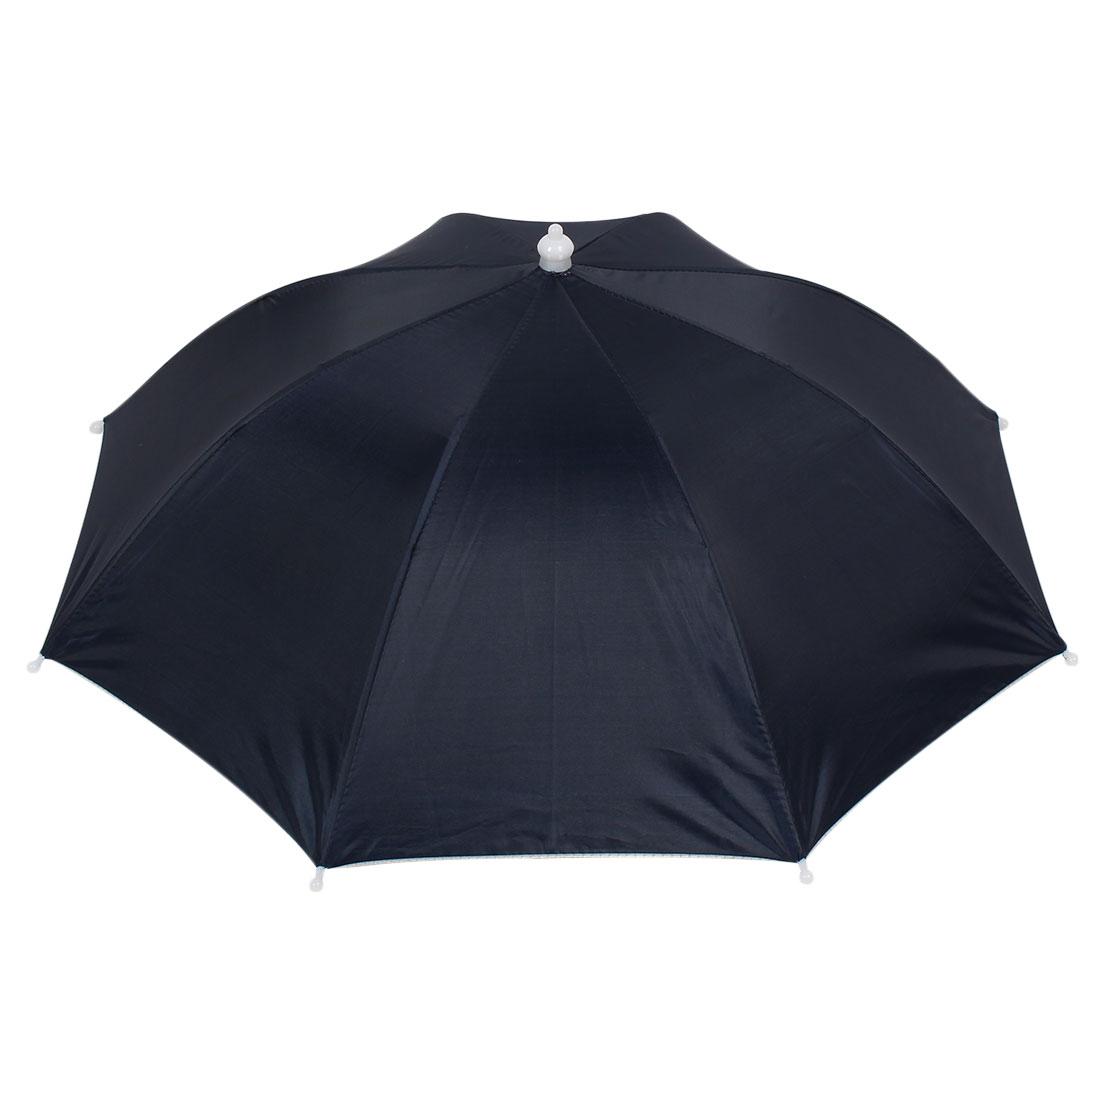 Fishing Dark Blue Canopy 8 Ribs Elastic Head Band Umbrella